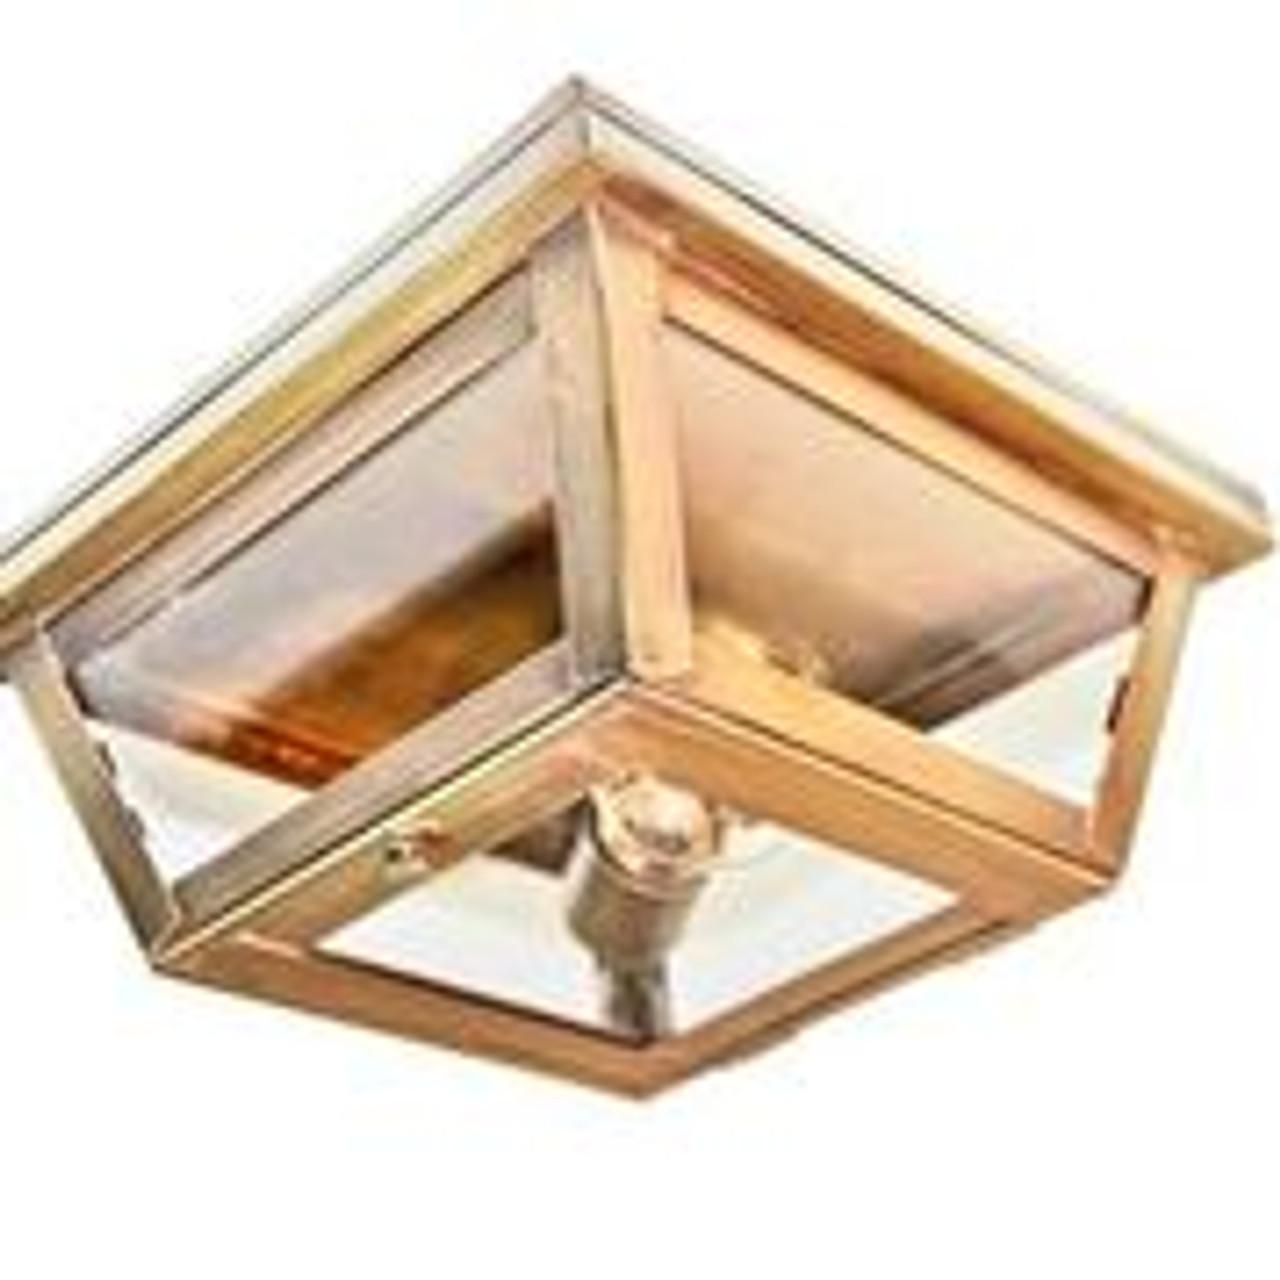 Northeast Lantern Brass Outdoor Flush Mount Ceiling Light Handcrafted